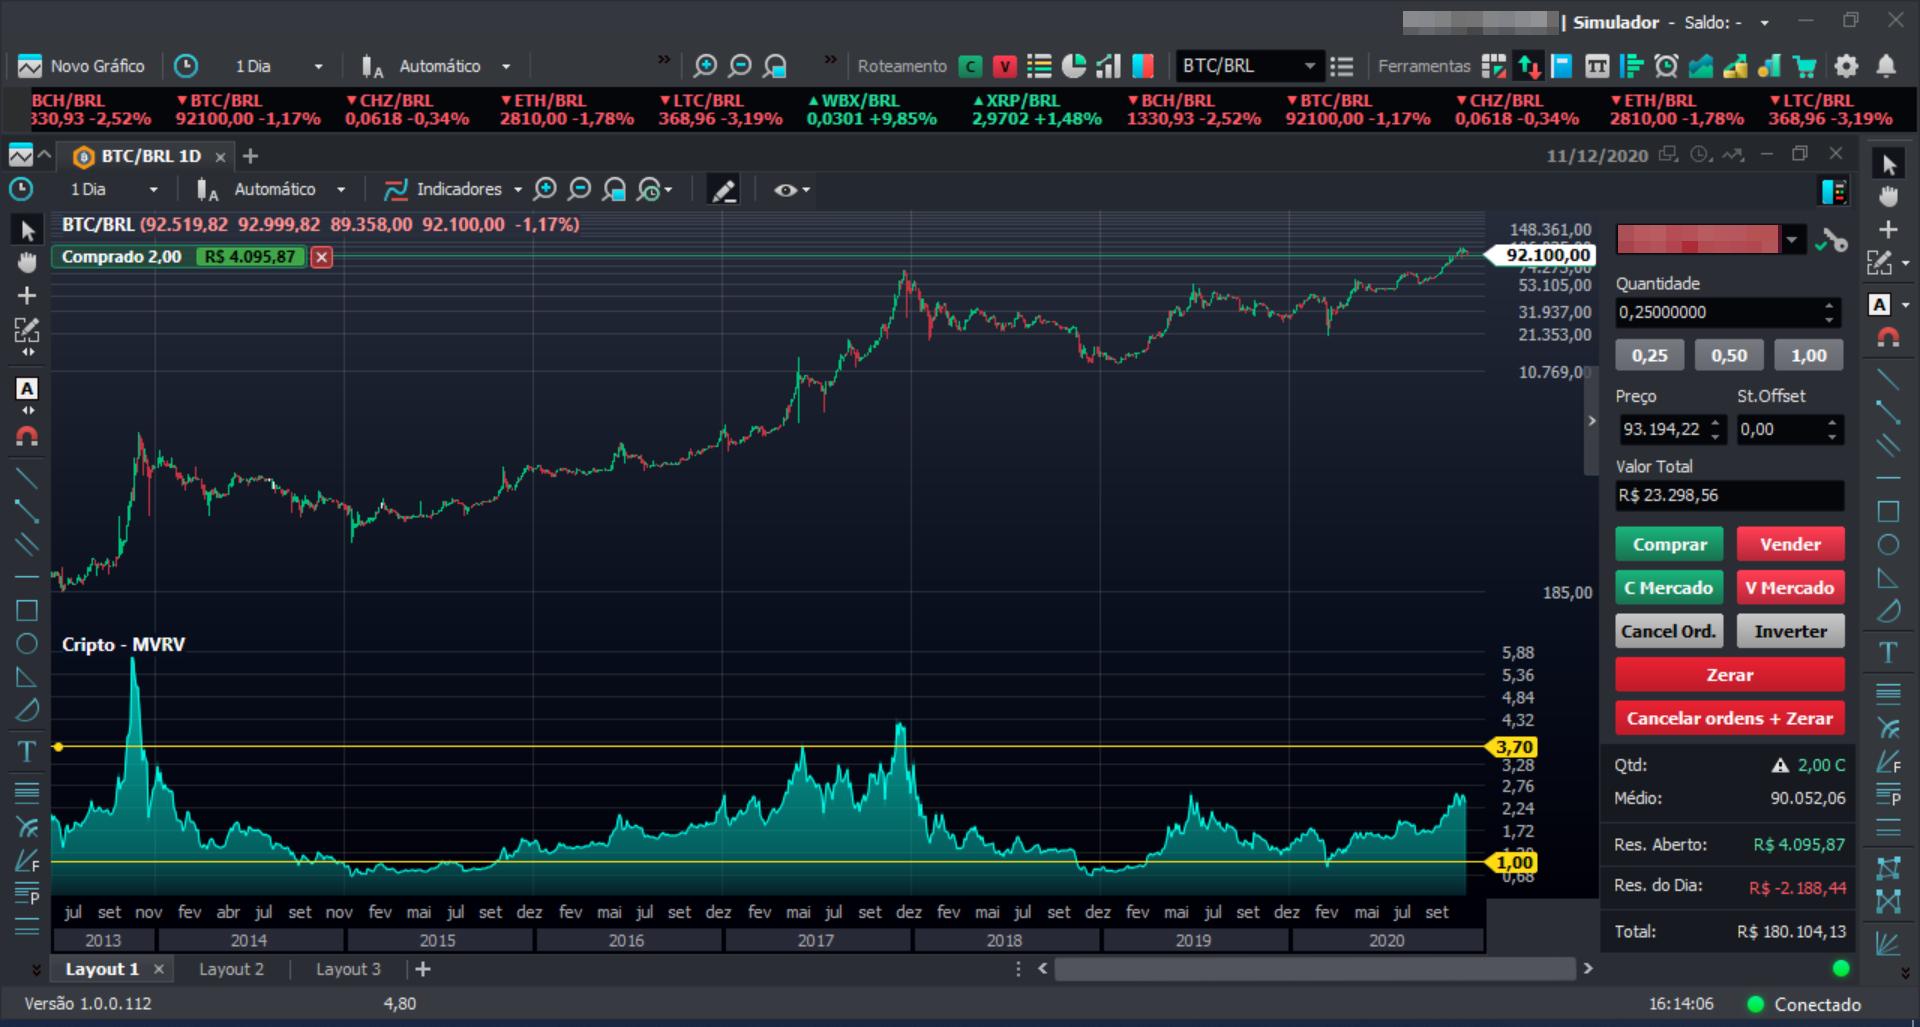 Gráfico Preço X indicador MVRV Bitcoin